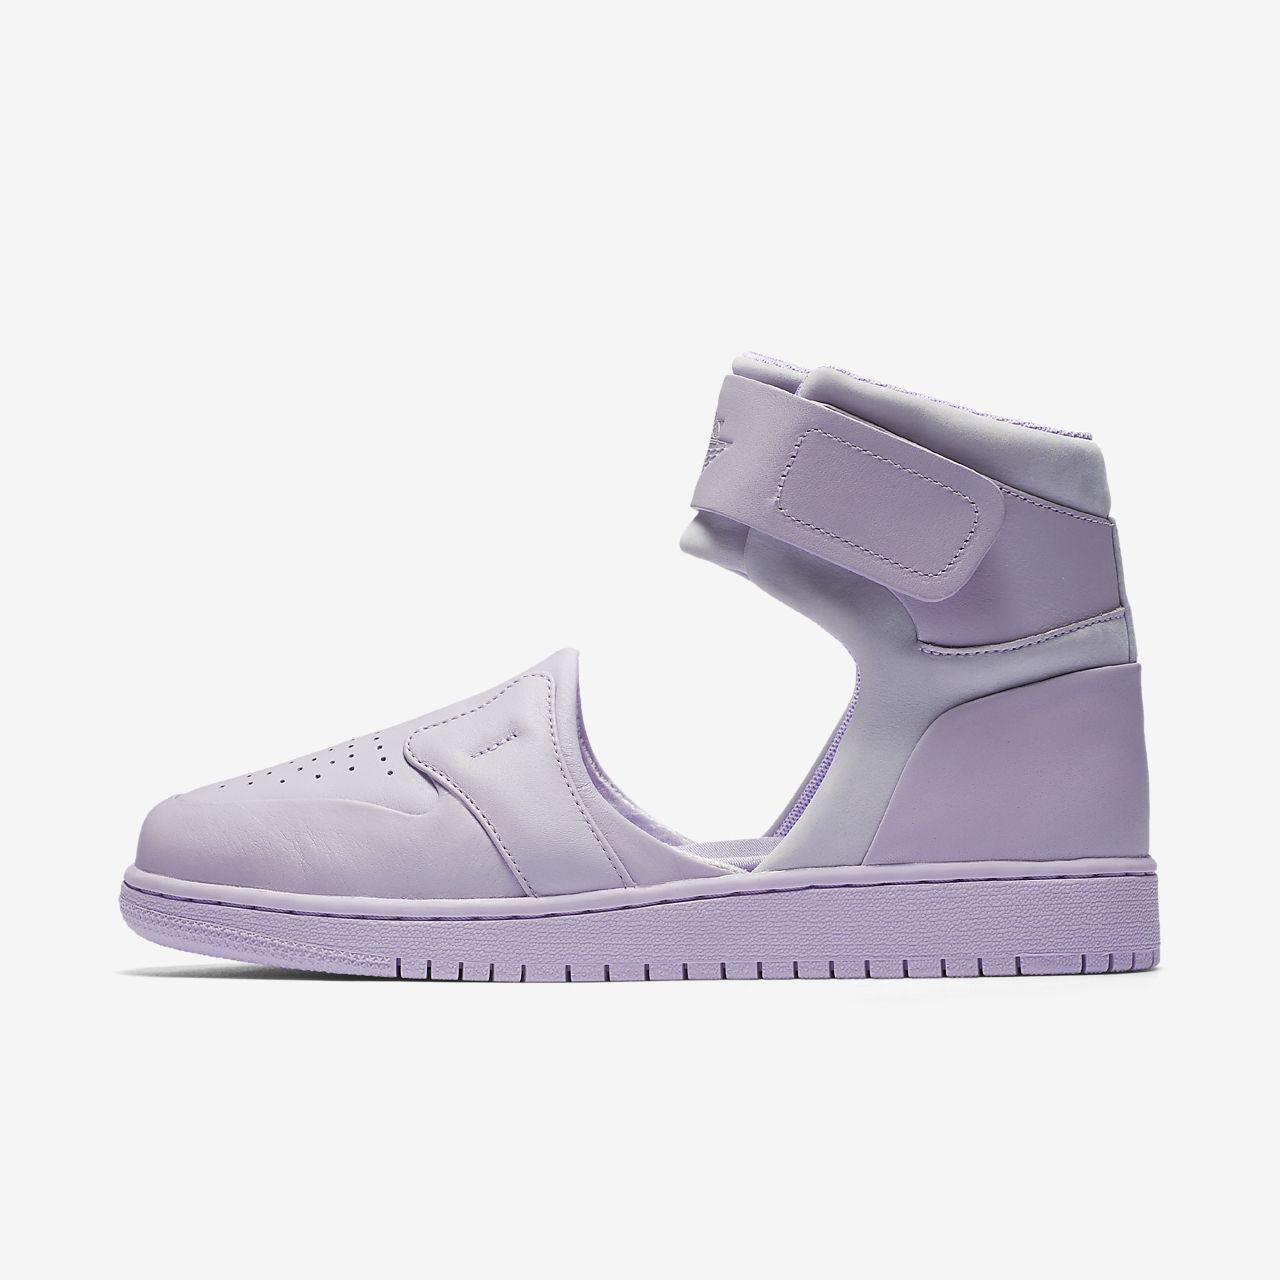 Dámská bota Jordan AJ1 Lover XX. Nike.com CZ ebbde20590